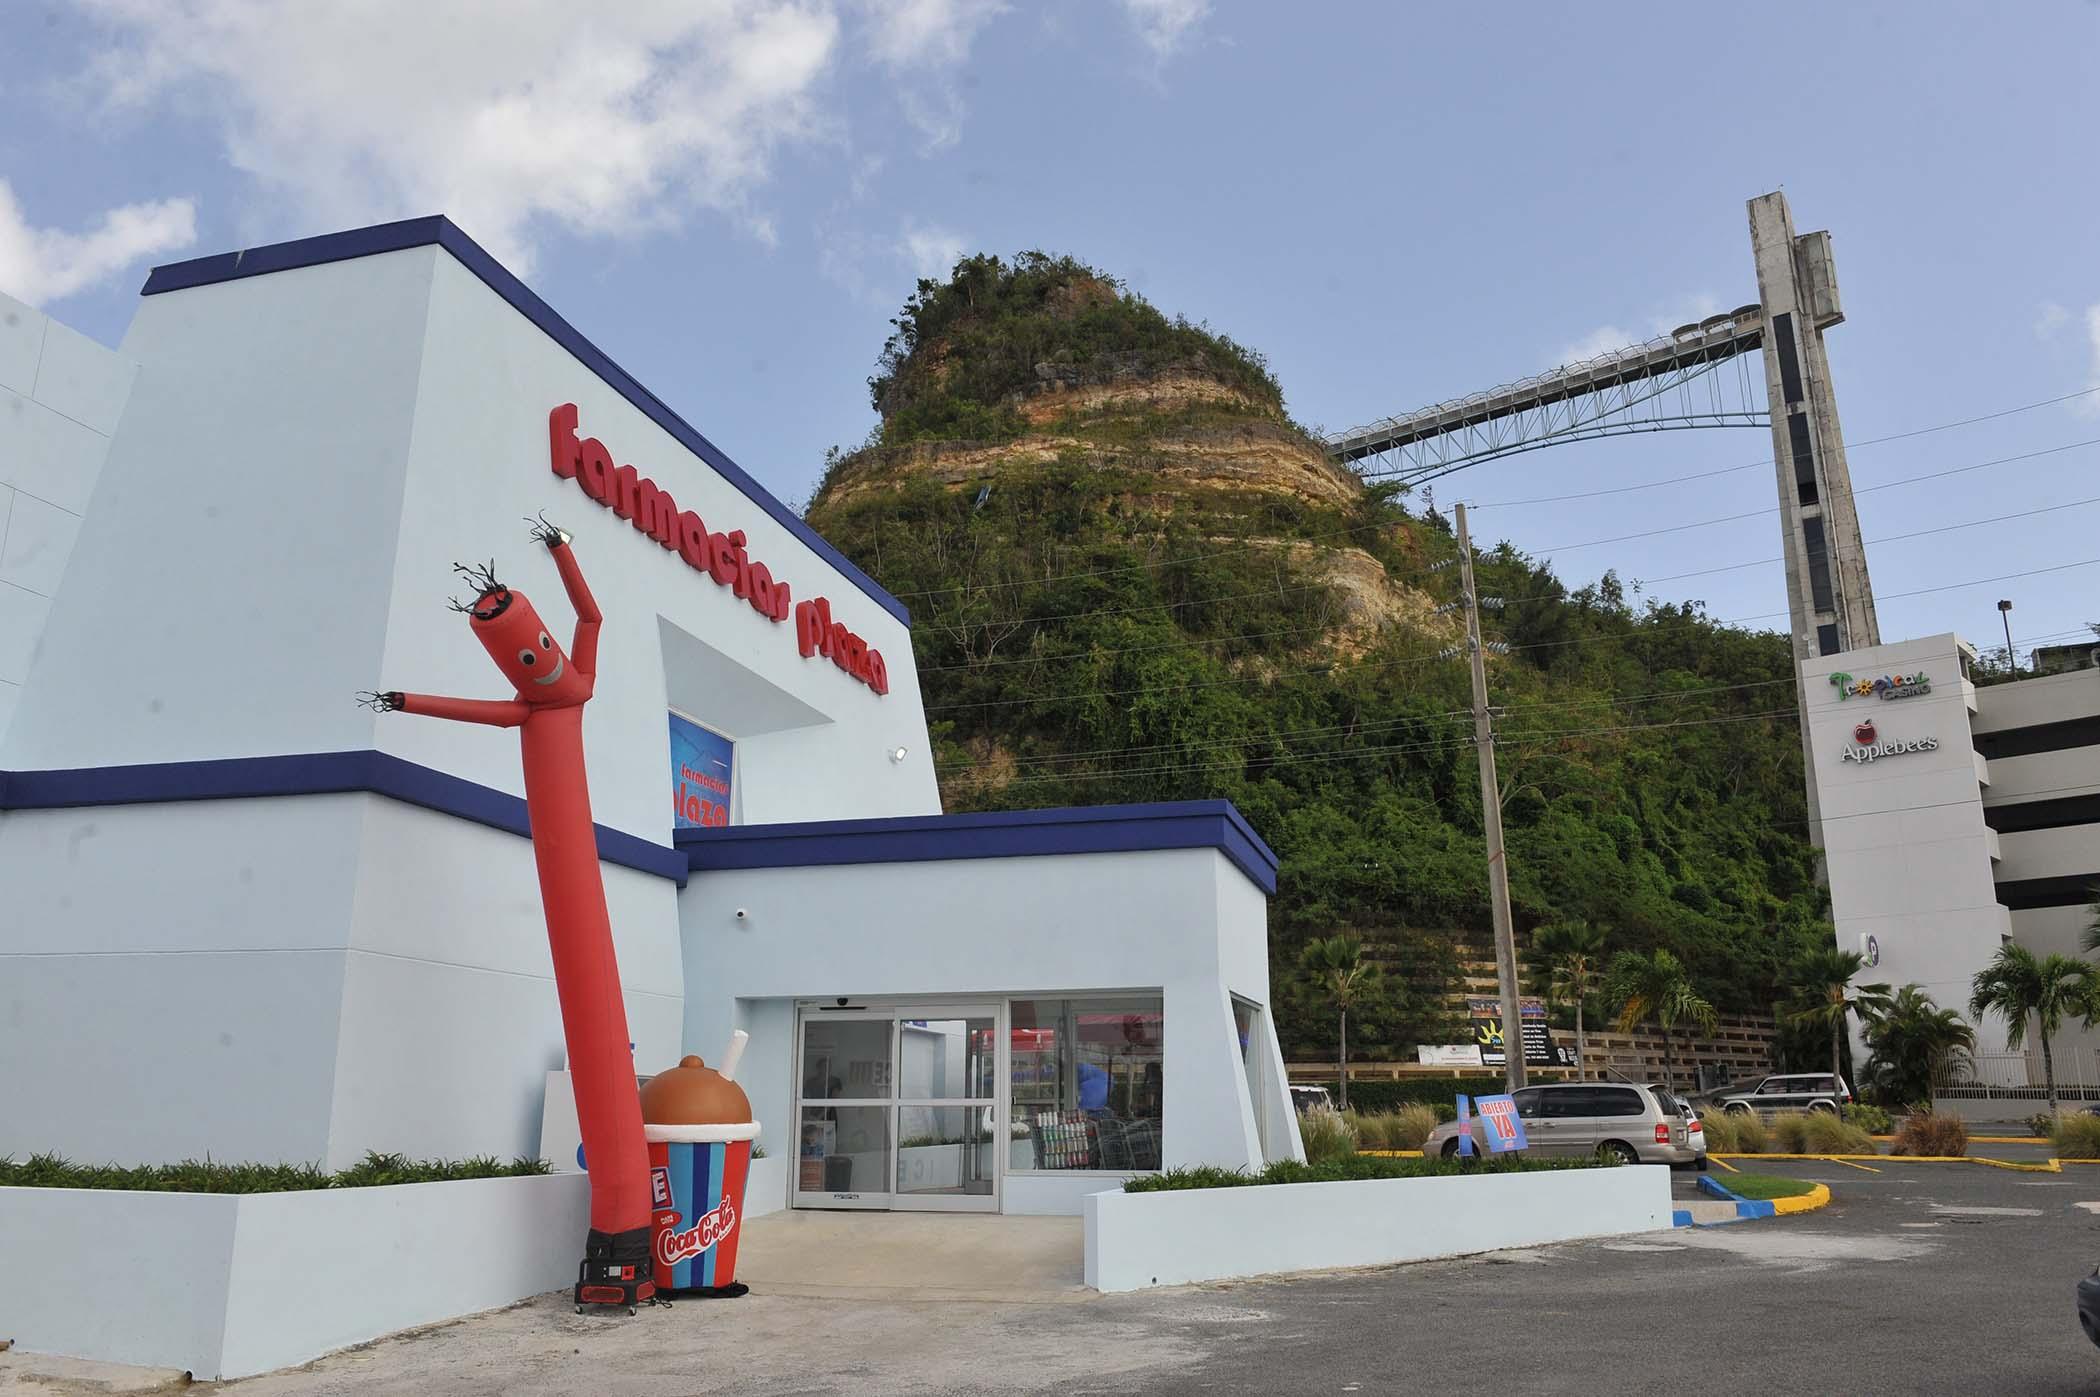 Inauguracion_Farmacias_Plaza-Plaza_del_Sol-3.jpg